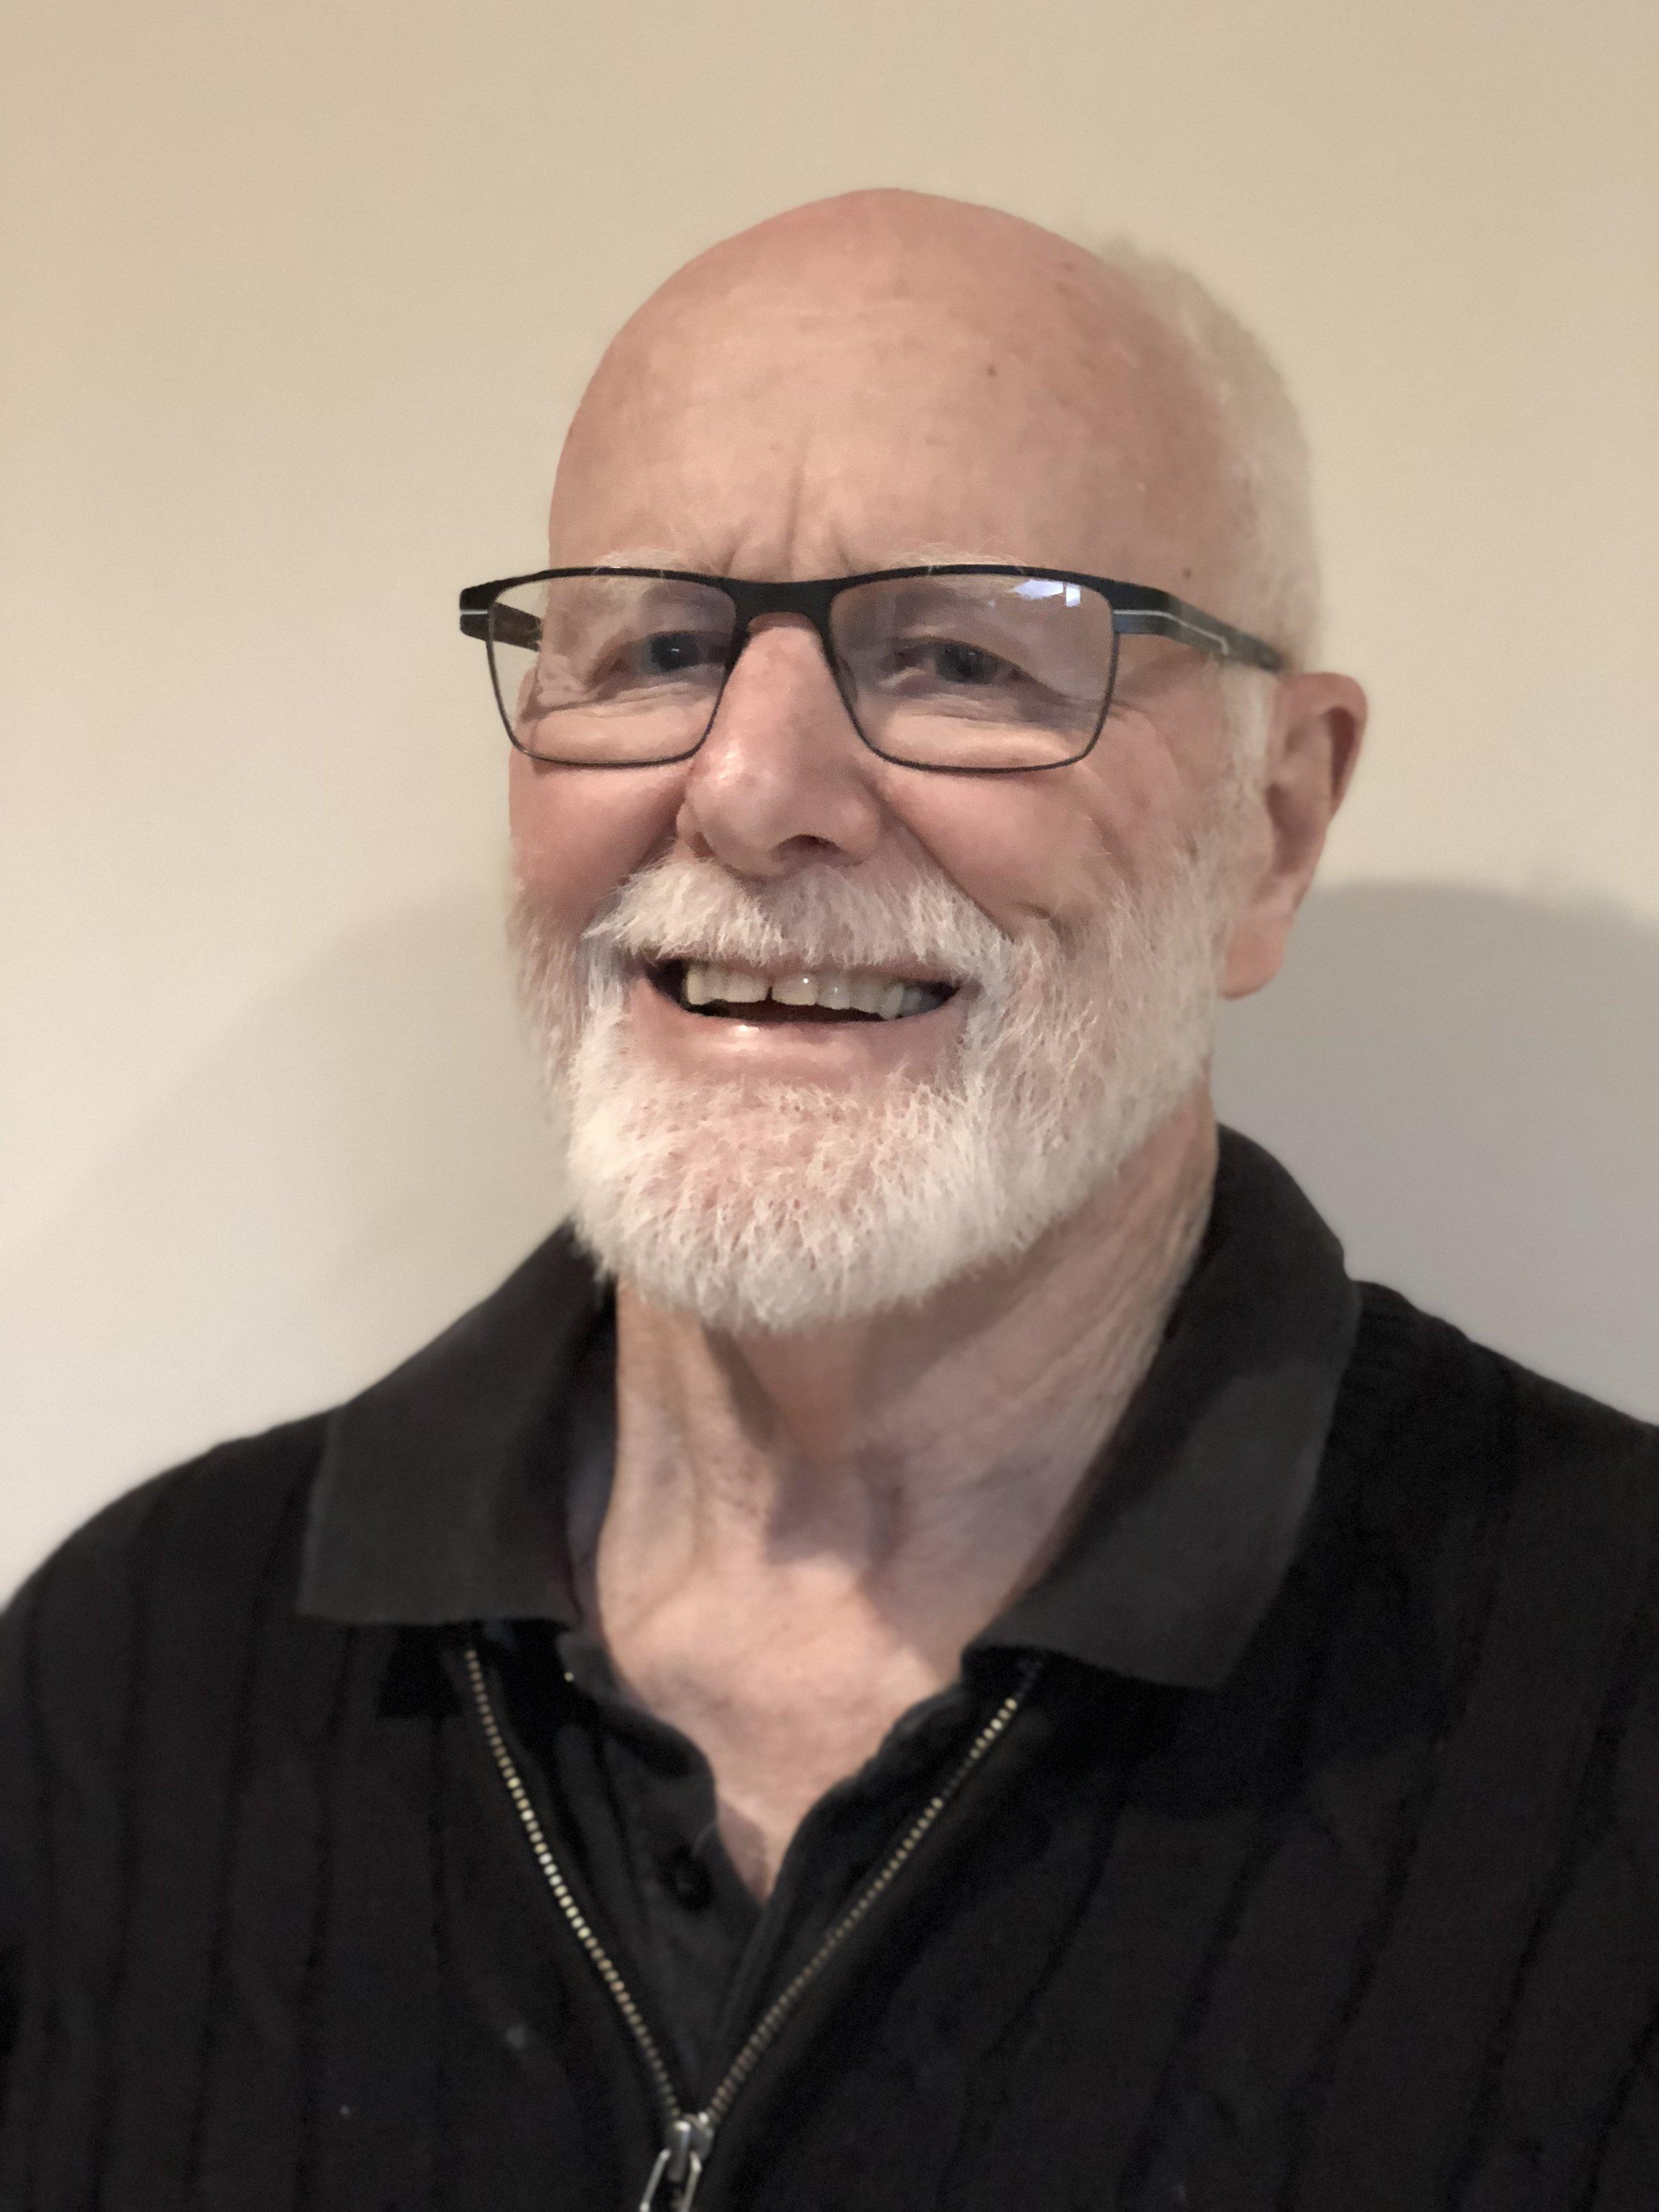 David James - Communications Officer